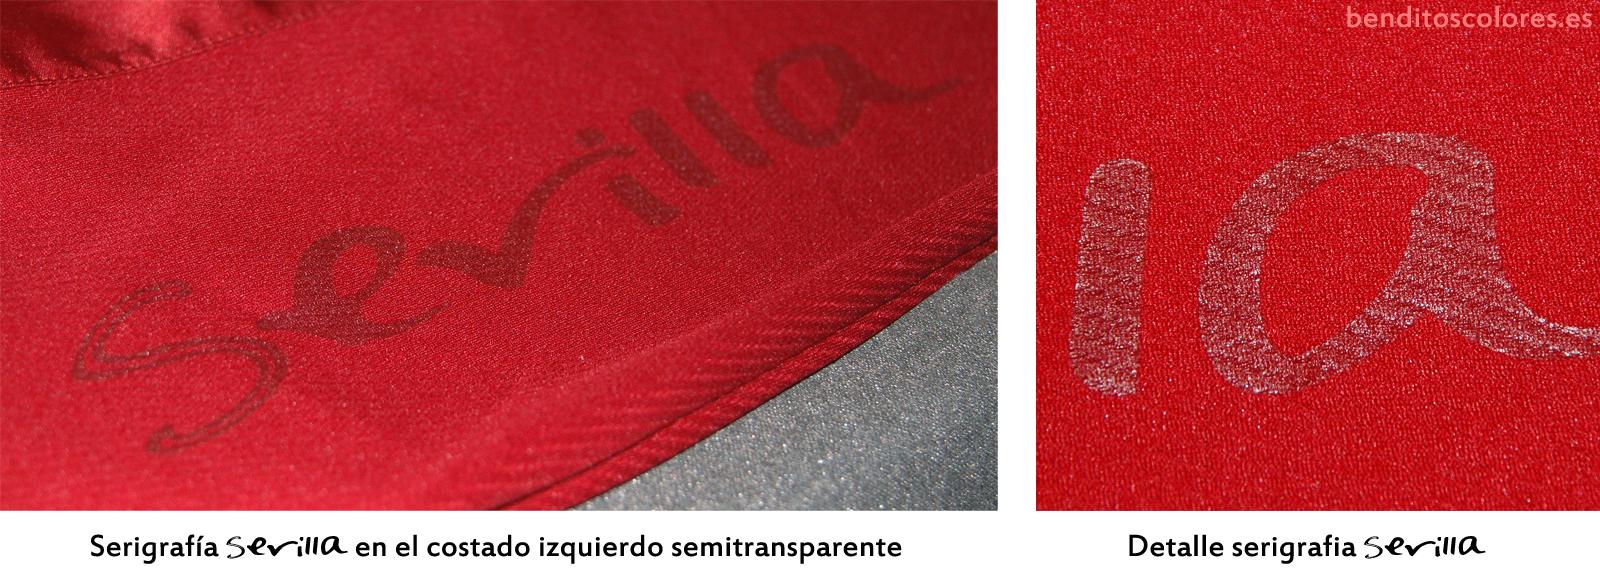 39.-2ª Equipación 2007-2008 | Benditos Colores